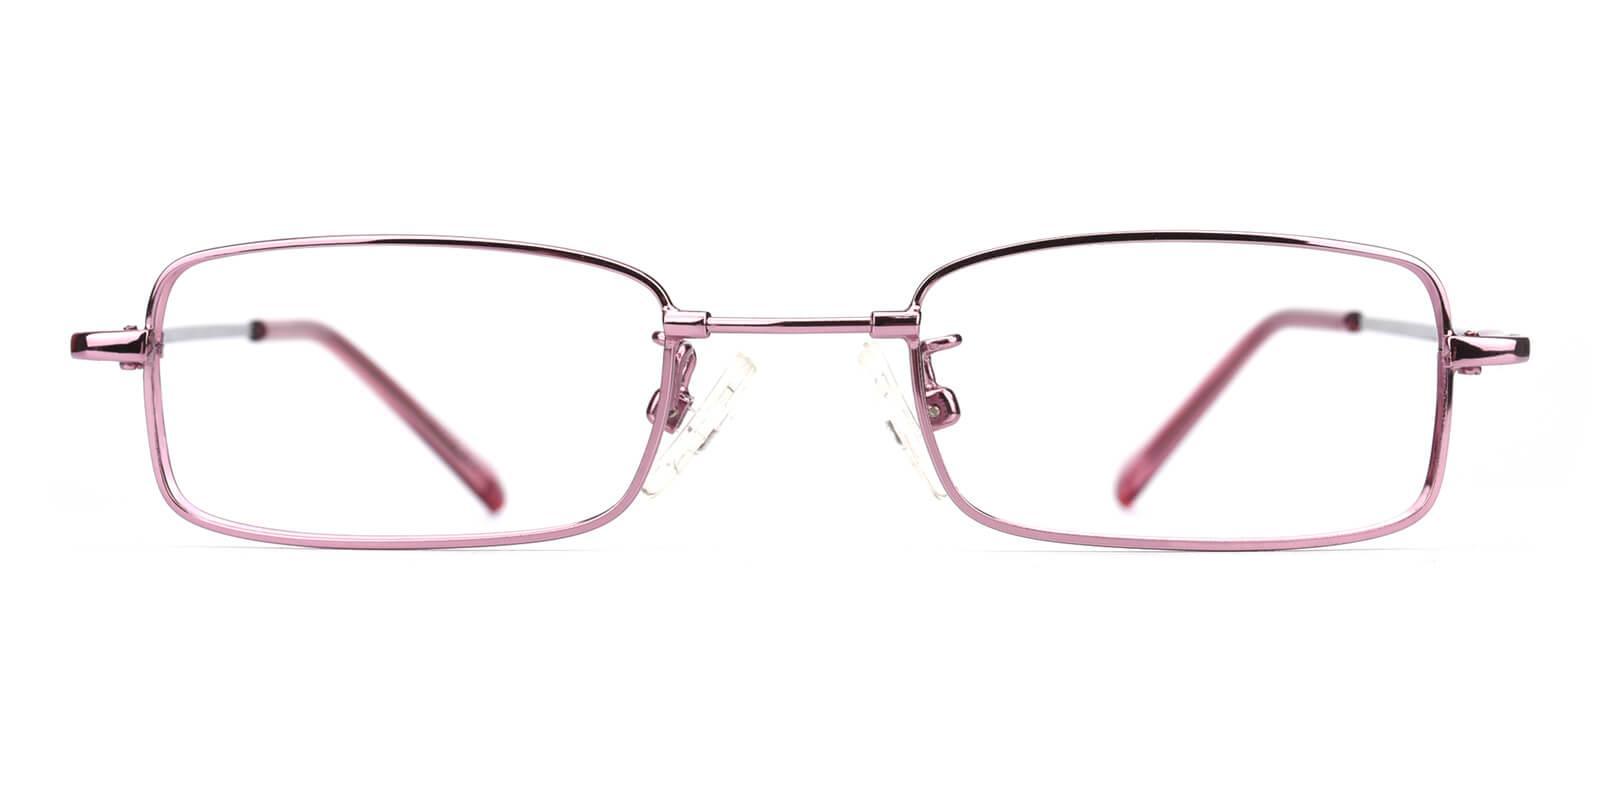 Lanscripe-Purple-Rectangle-Titanium-Eyeglasses-additional2